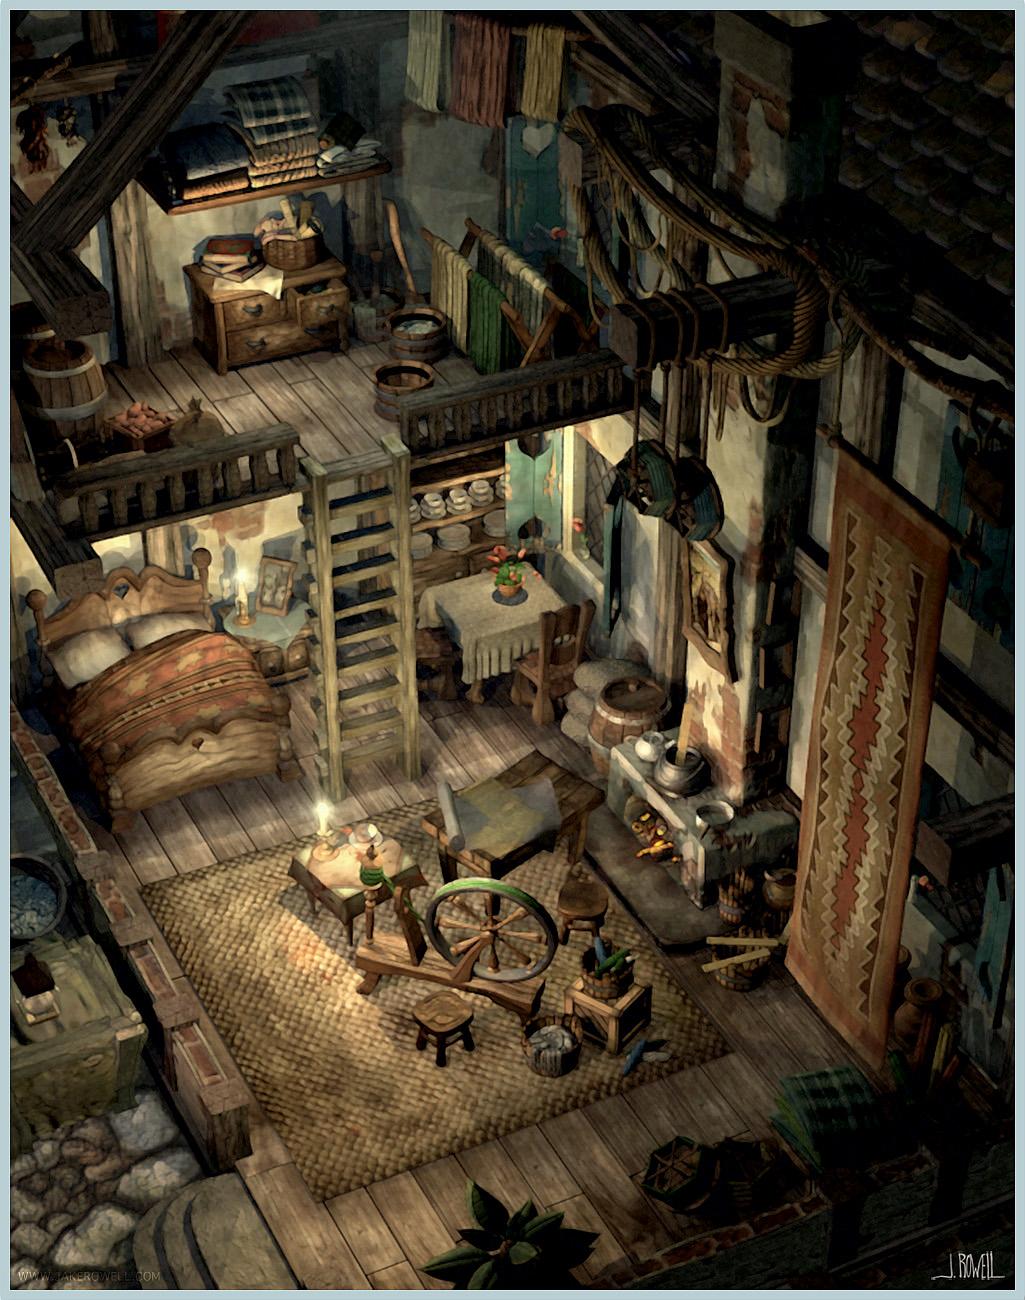 Final Fantasy Ix Jakerowell Design Town1 Jpg